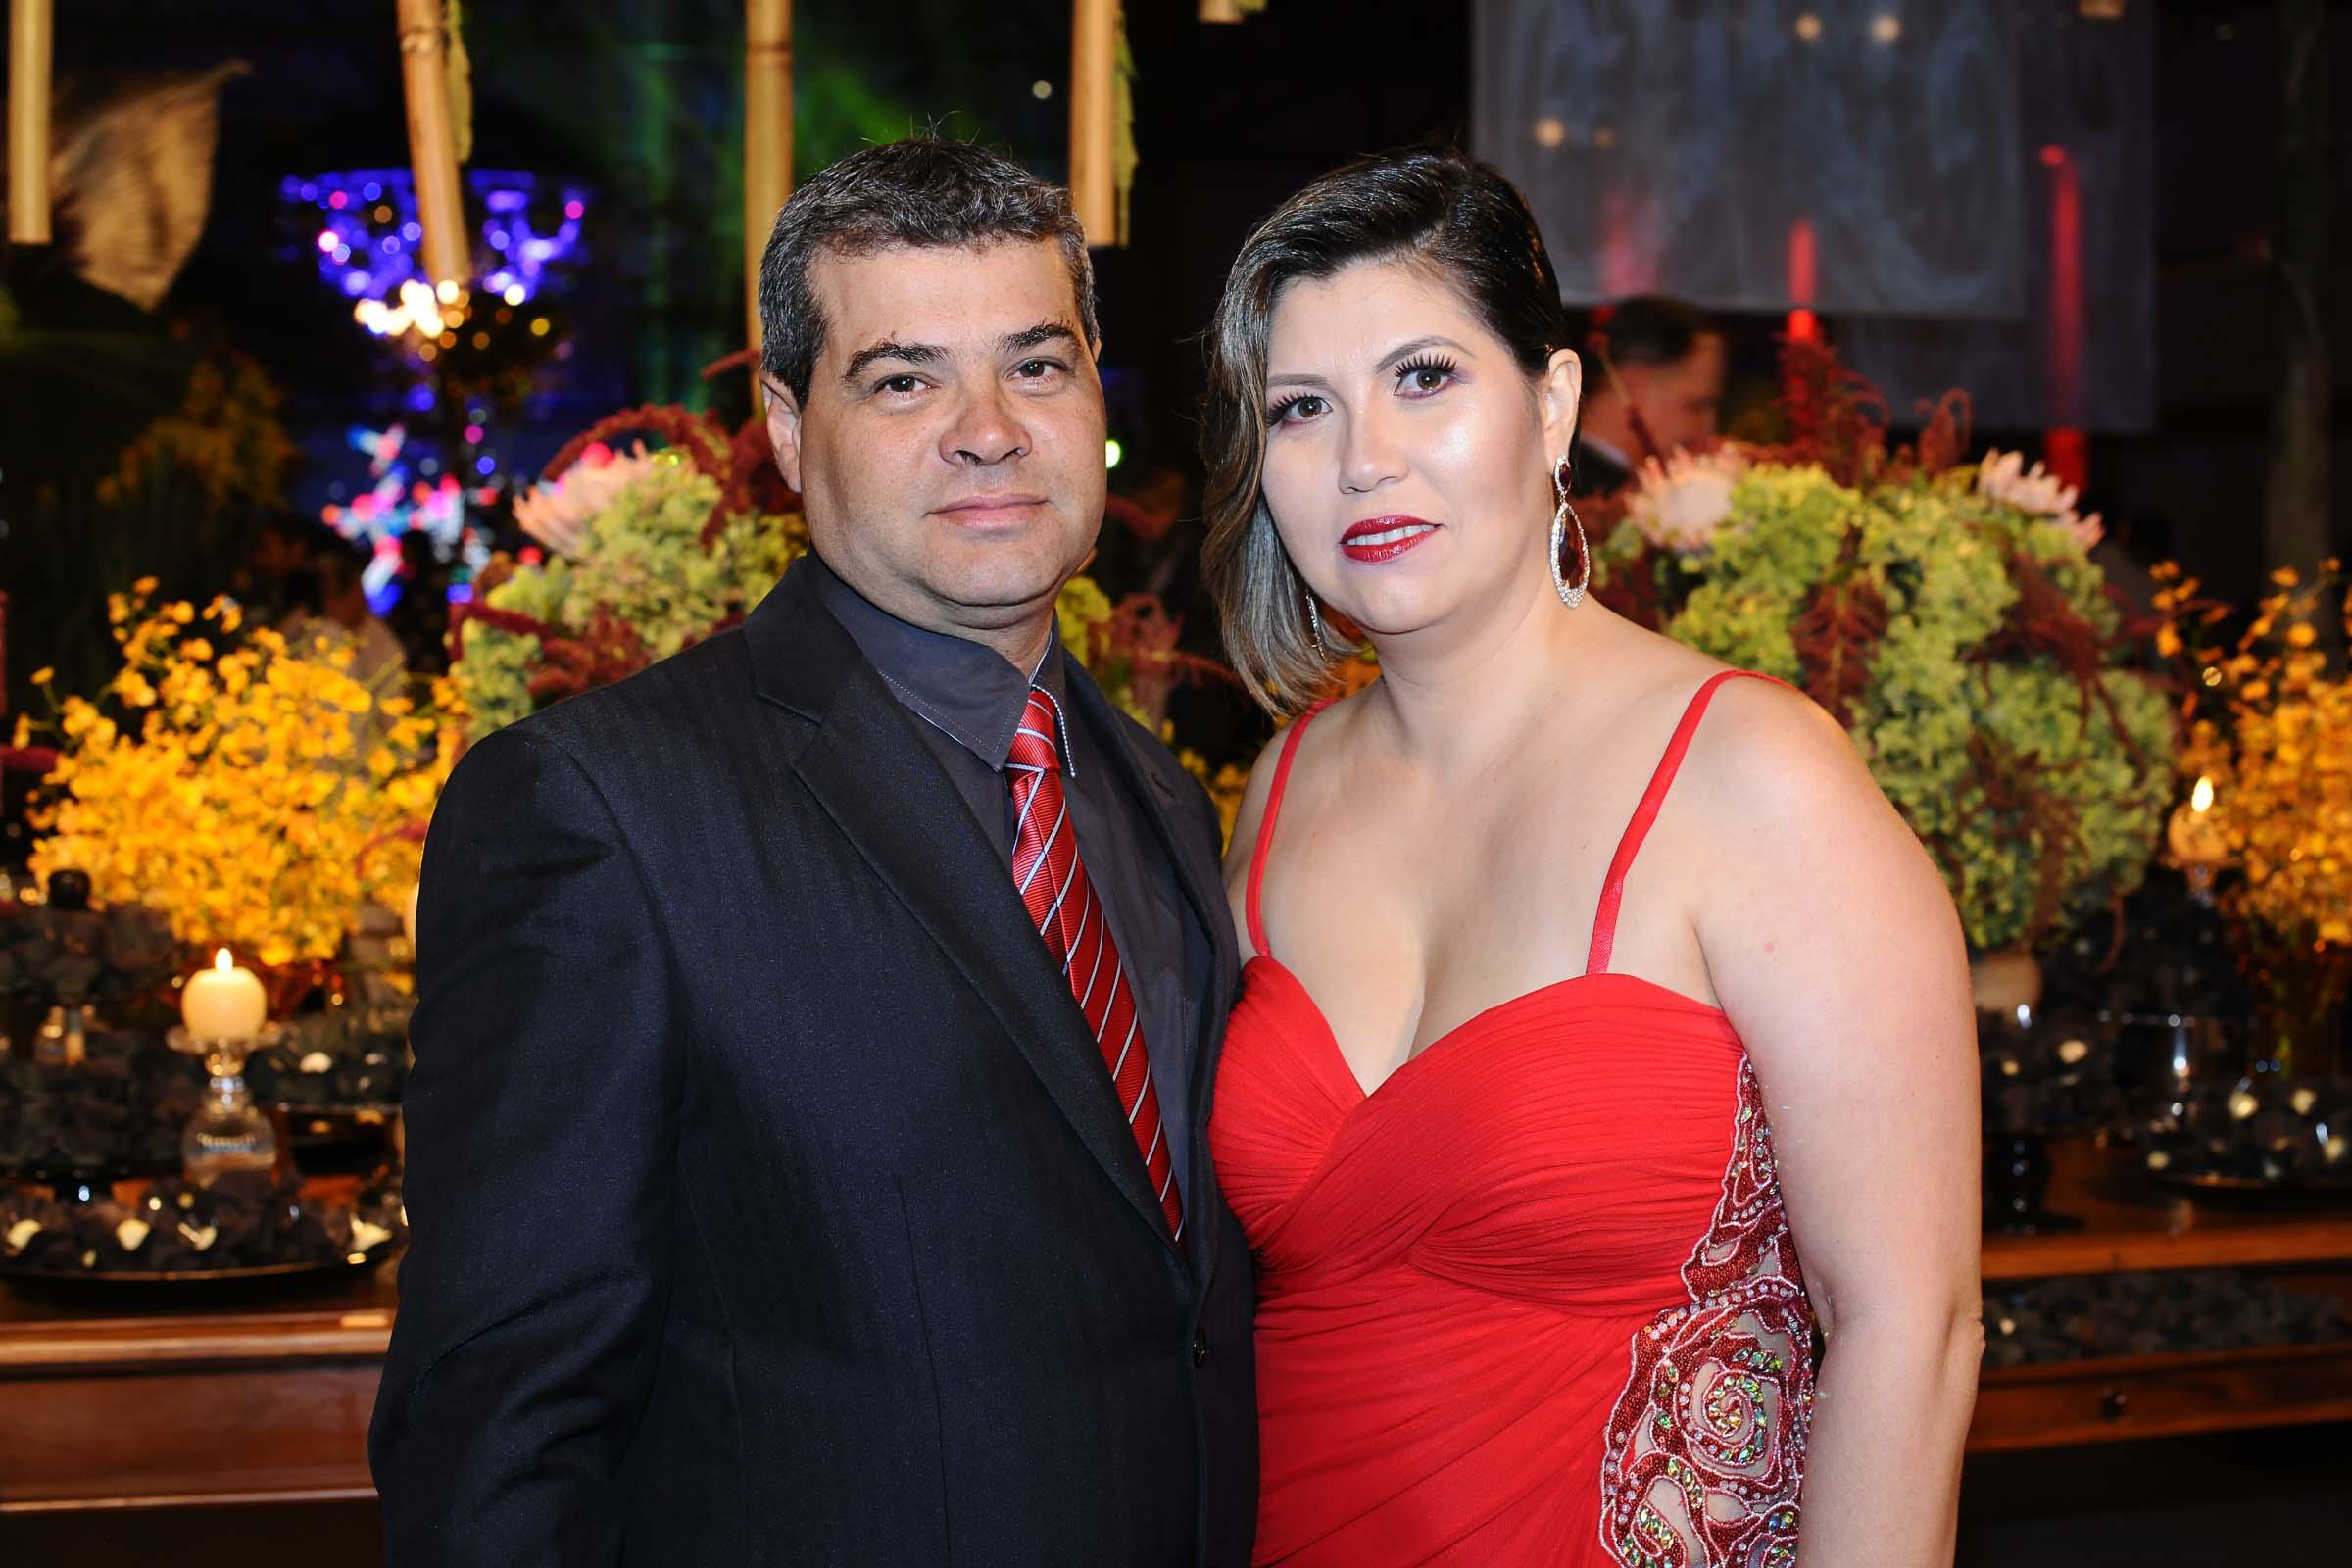 O casal Marijane e Ricardo Carrelo